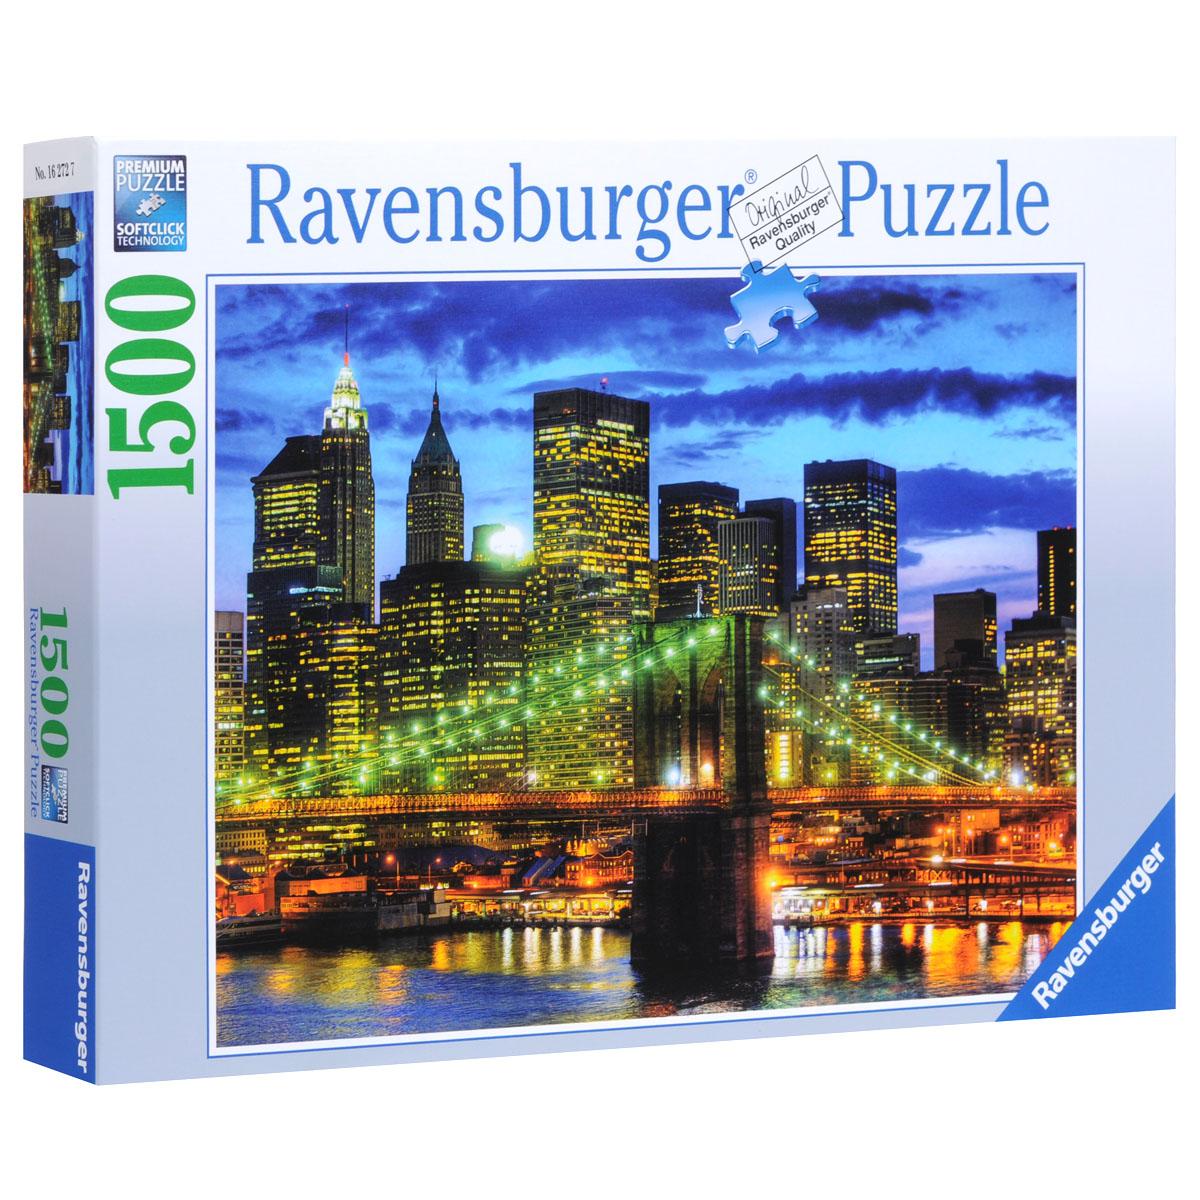 Ravensburger Небоскребы Нью-Йорка. Пазл, 1500 элементов